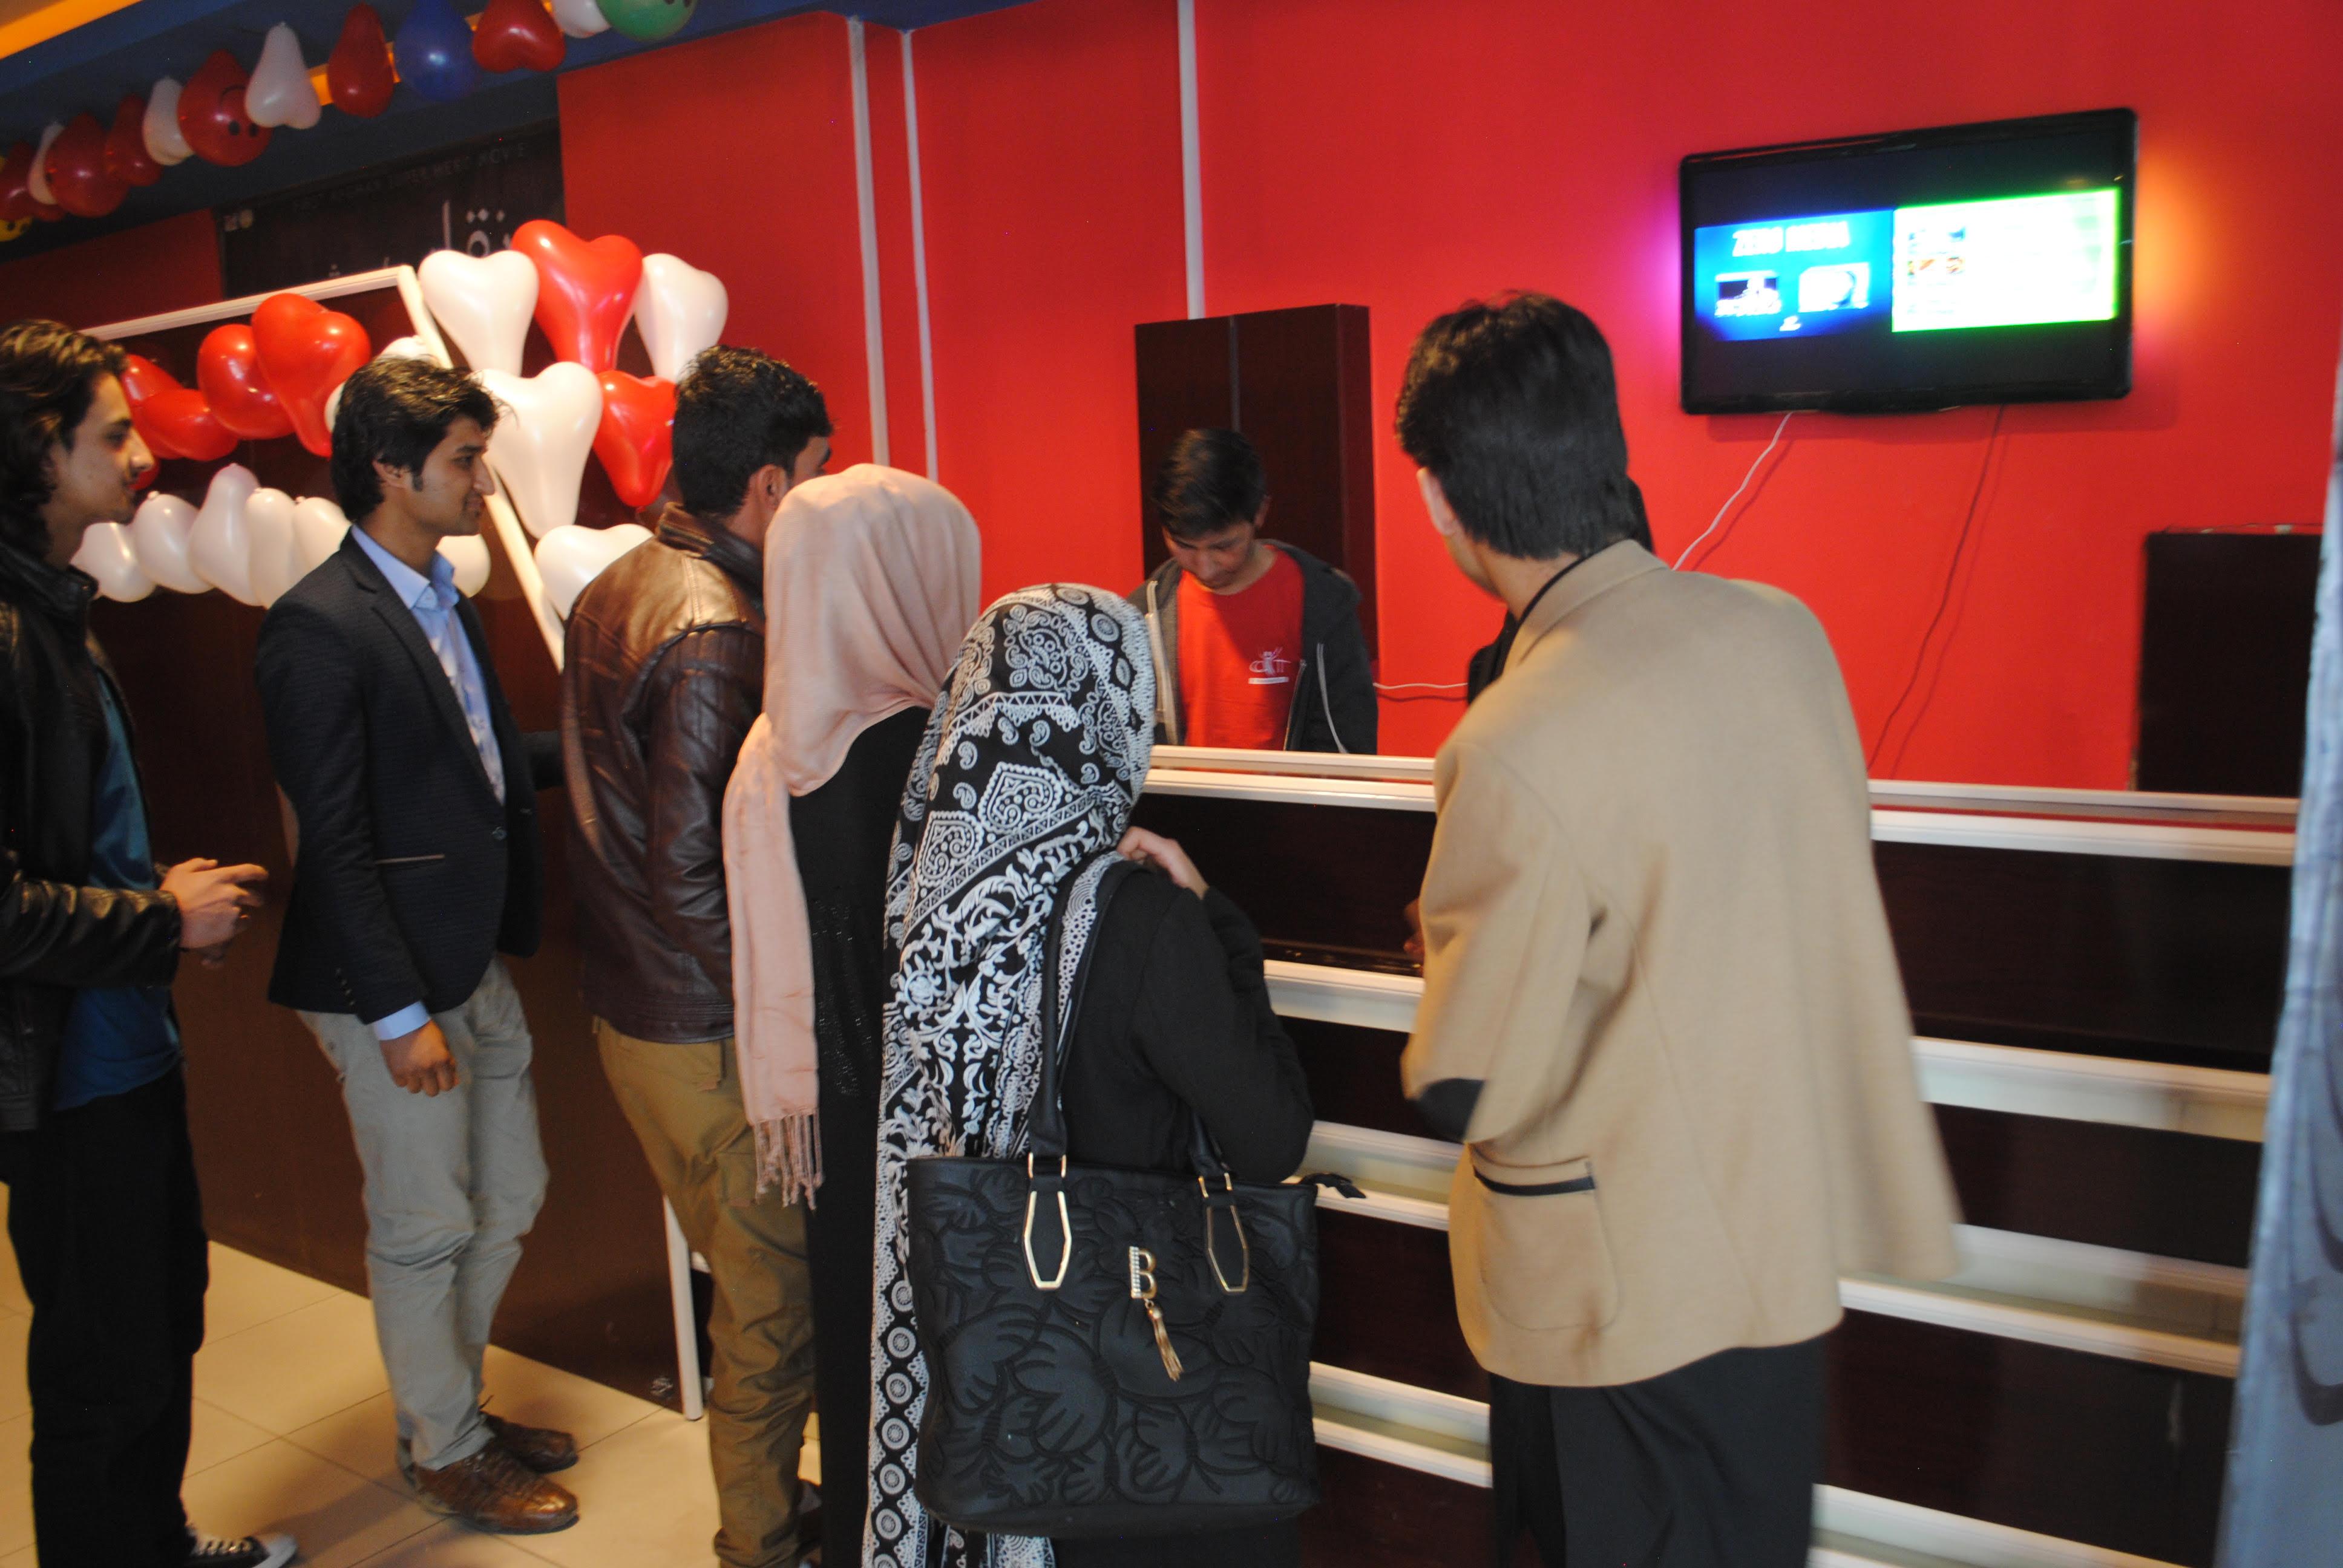 Moviegoers welcome family-friendly cinema in Kabul